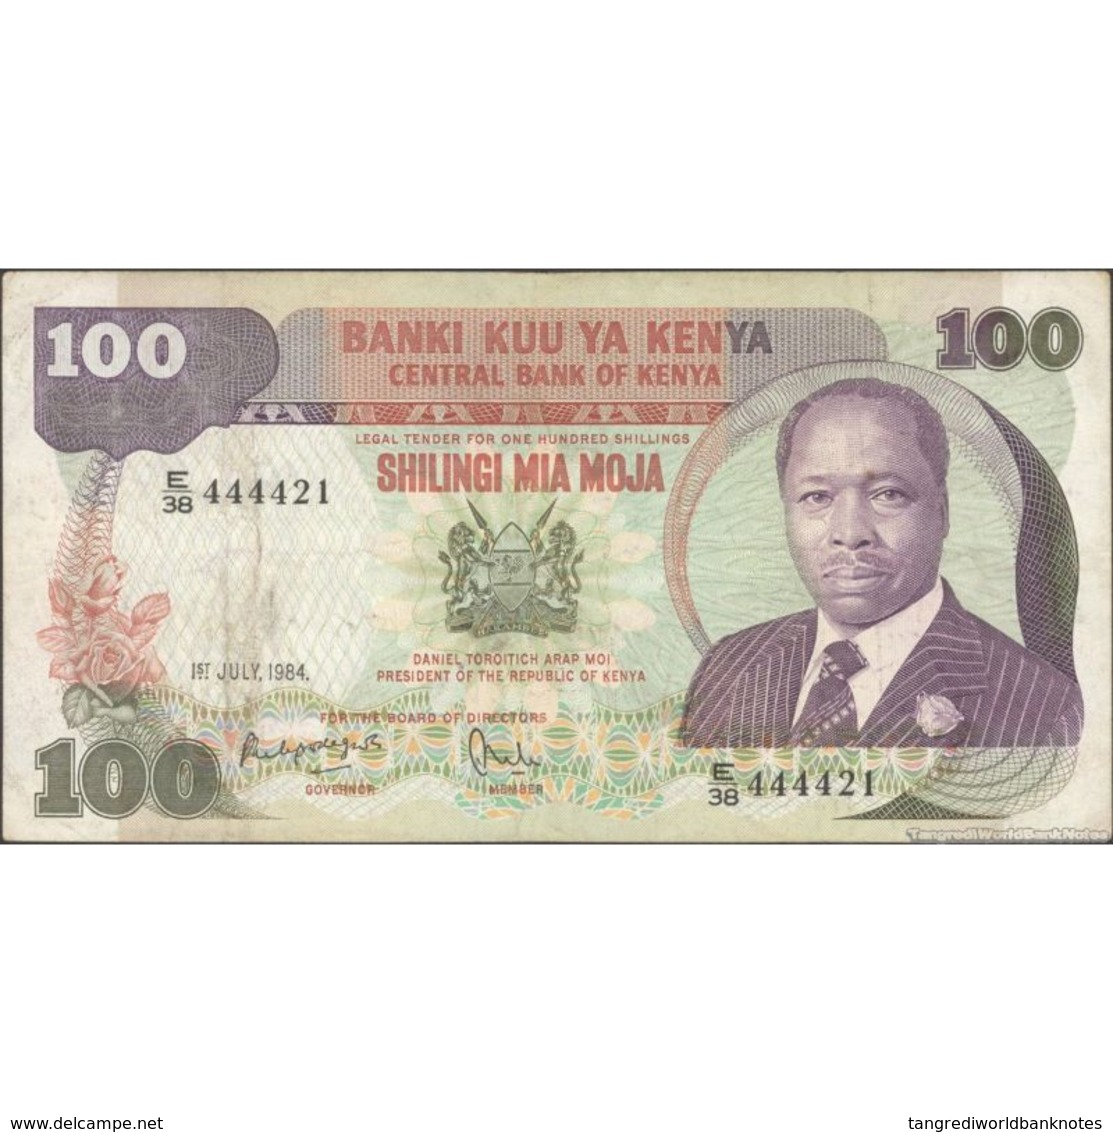 TWN - KENYA 23c - 100 Shillings 1.7.1984 E/38 444421 F+ - Kenya